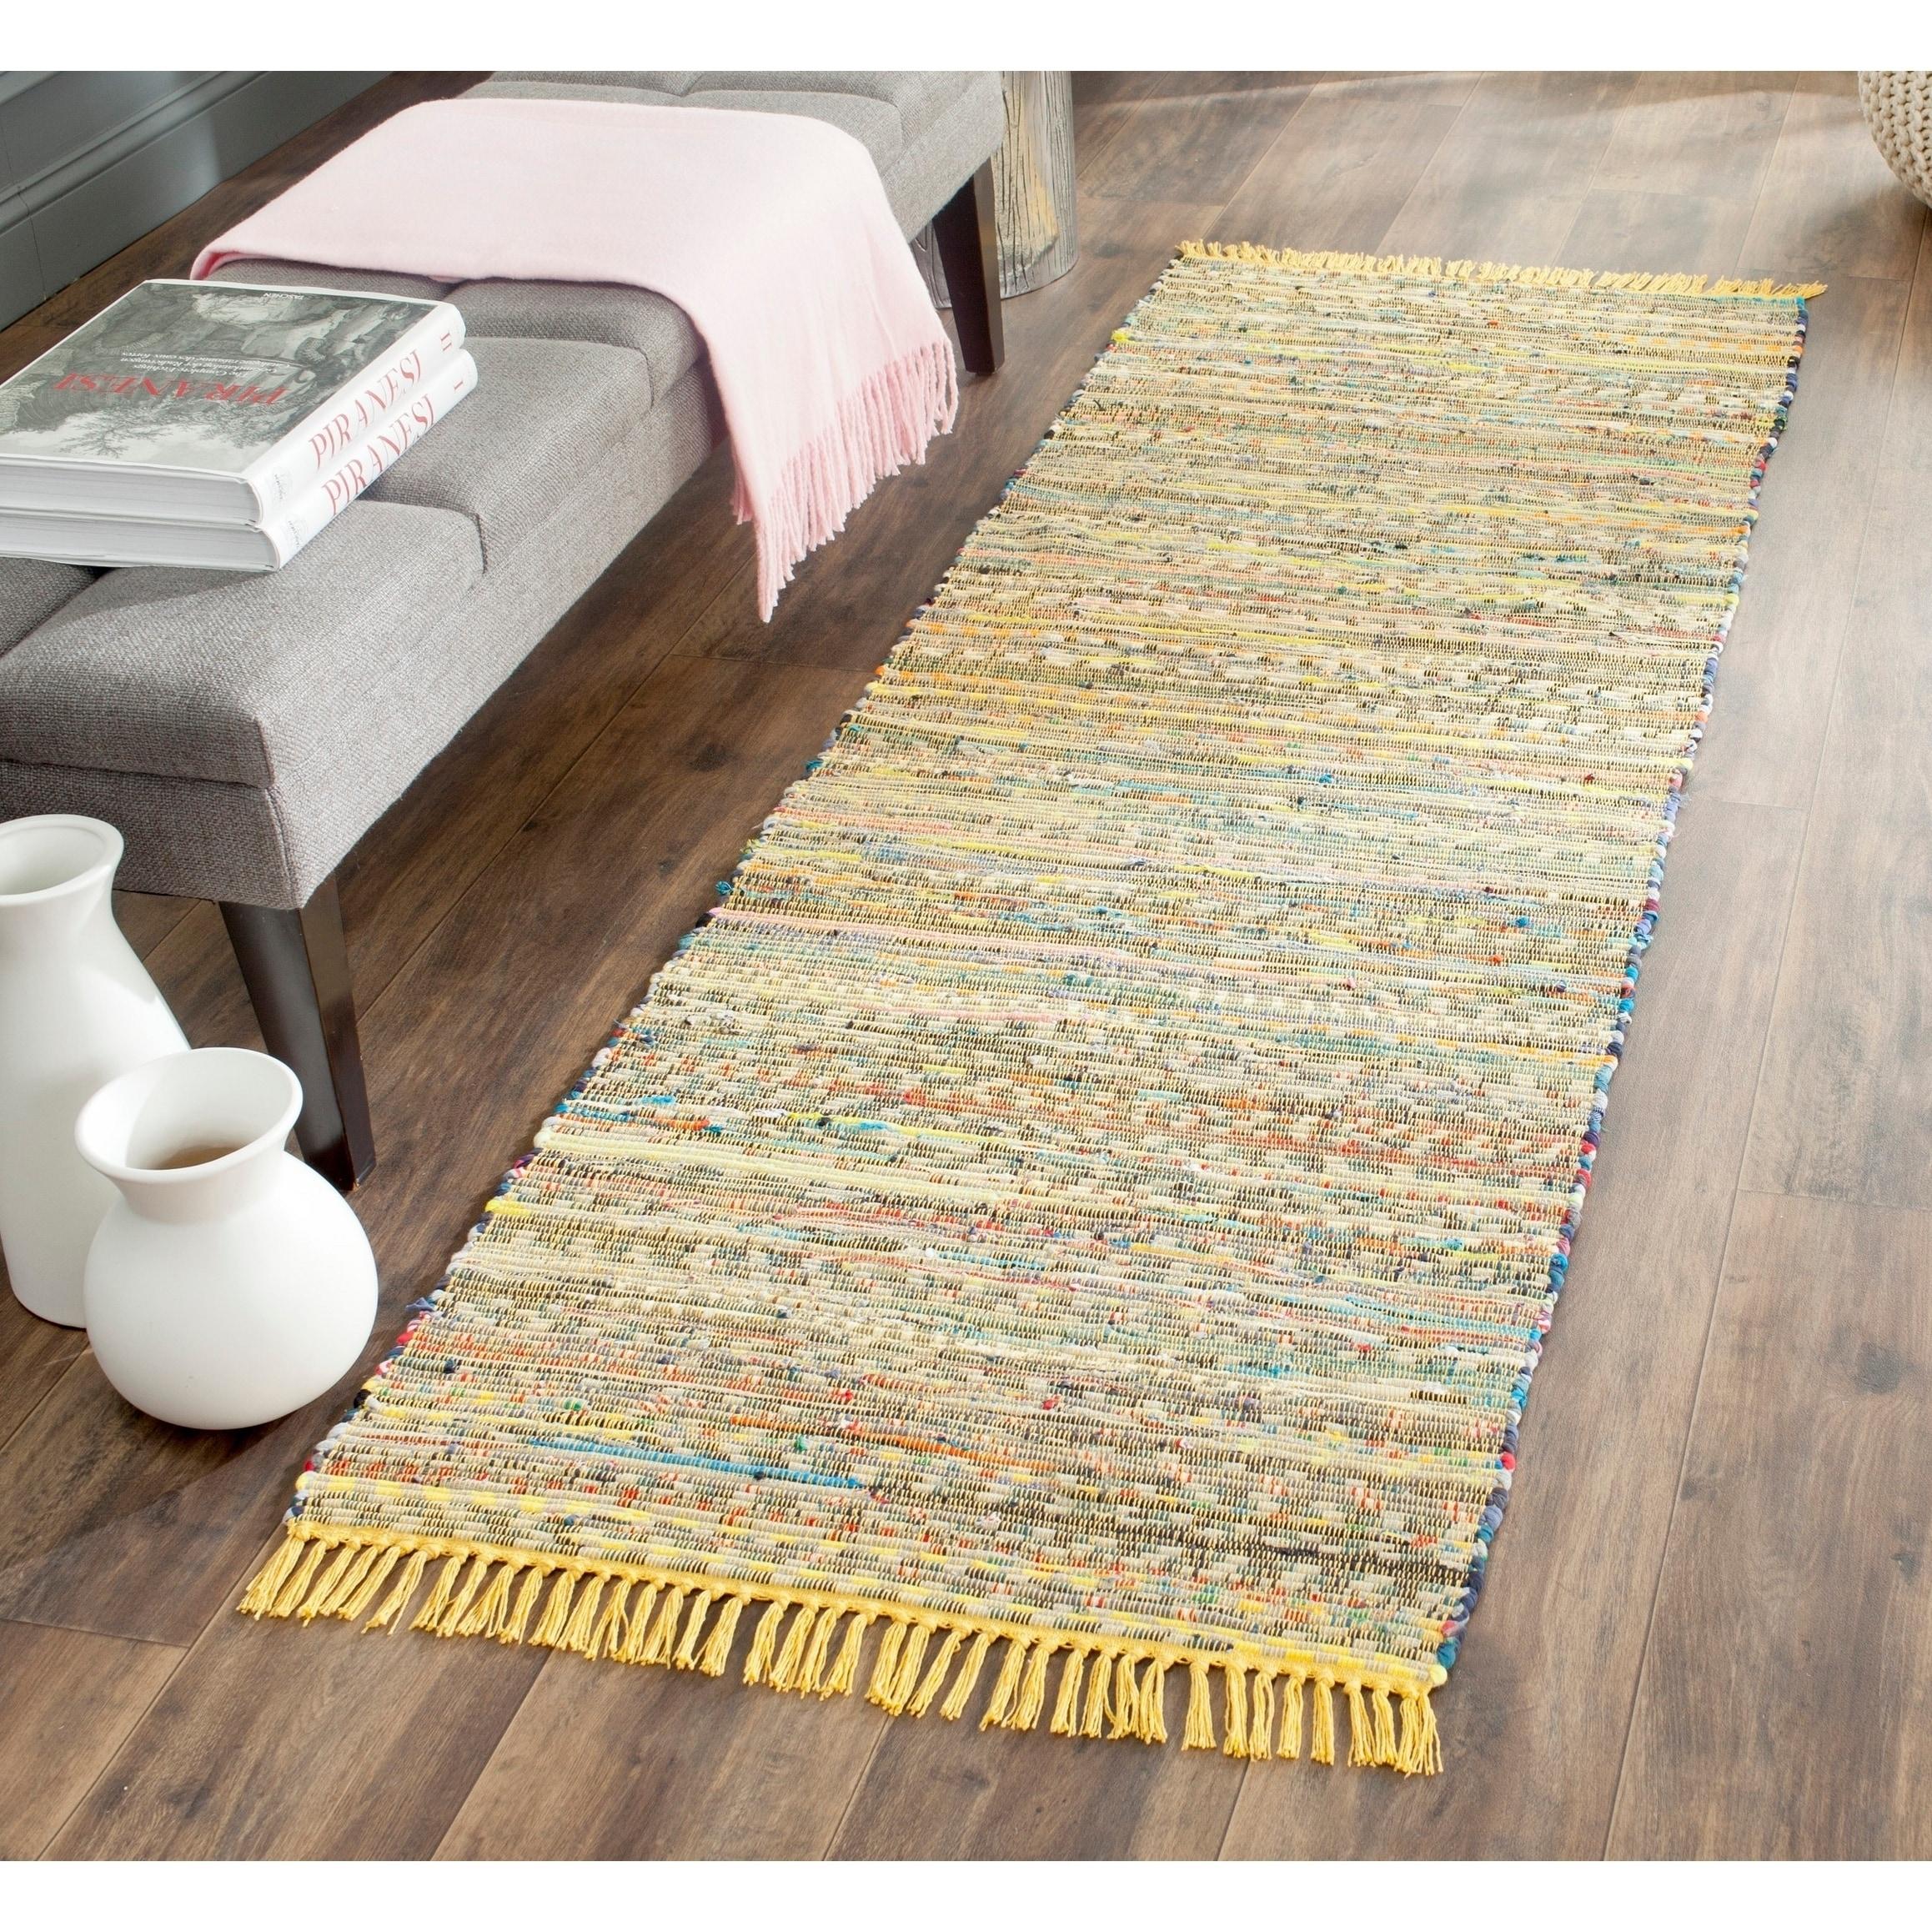 Safavieh Rag Rug Transitional Stripe Hand-Woven Cotton